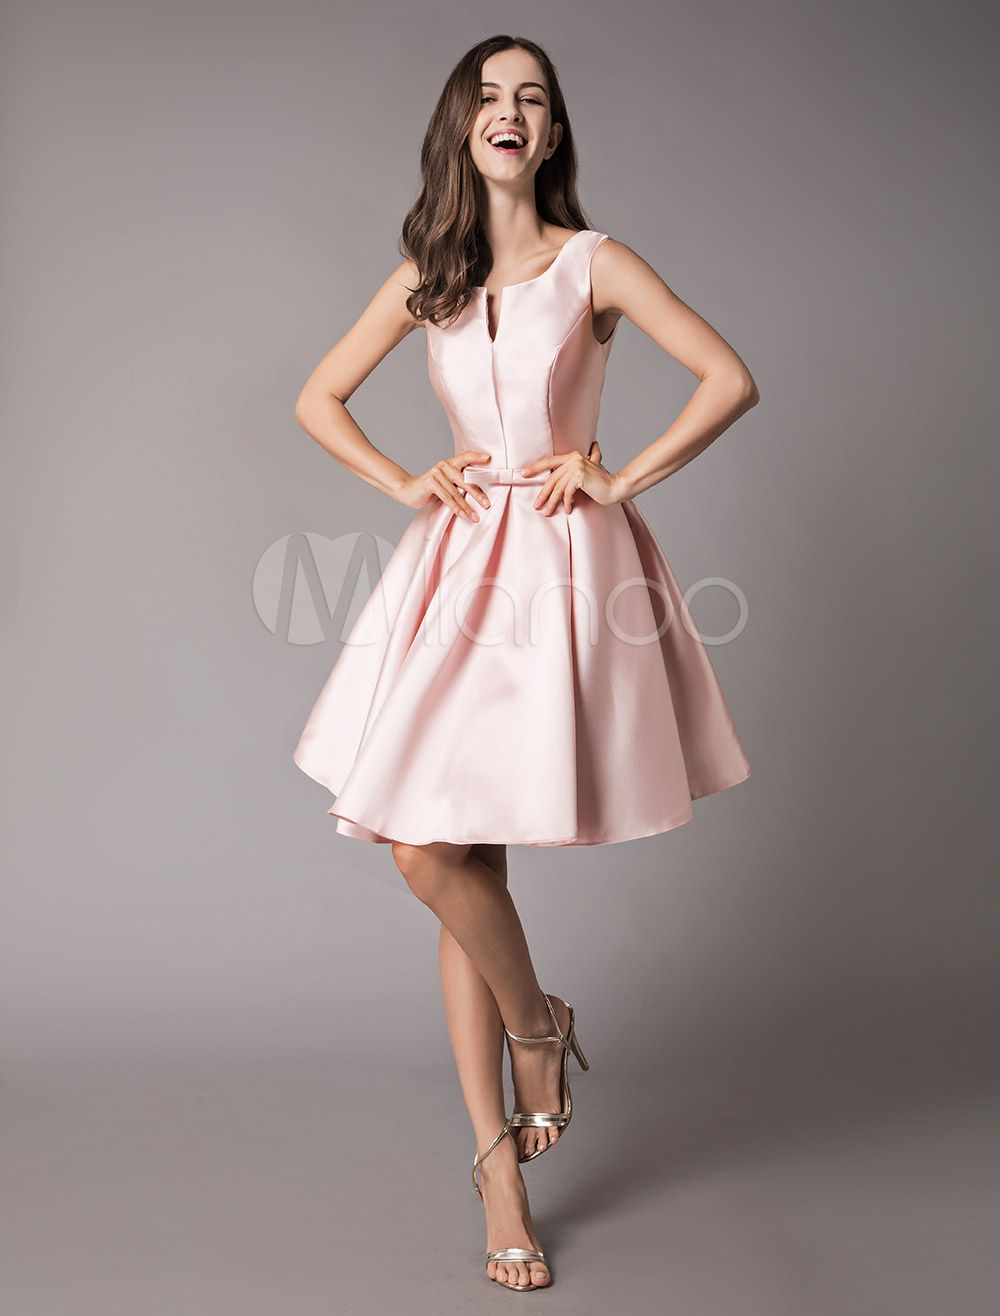 c272656a95f751 Satin Cocktail Dresses Soft Pink A Line Sleeveless Short Prom Dress ...